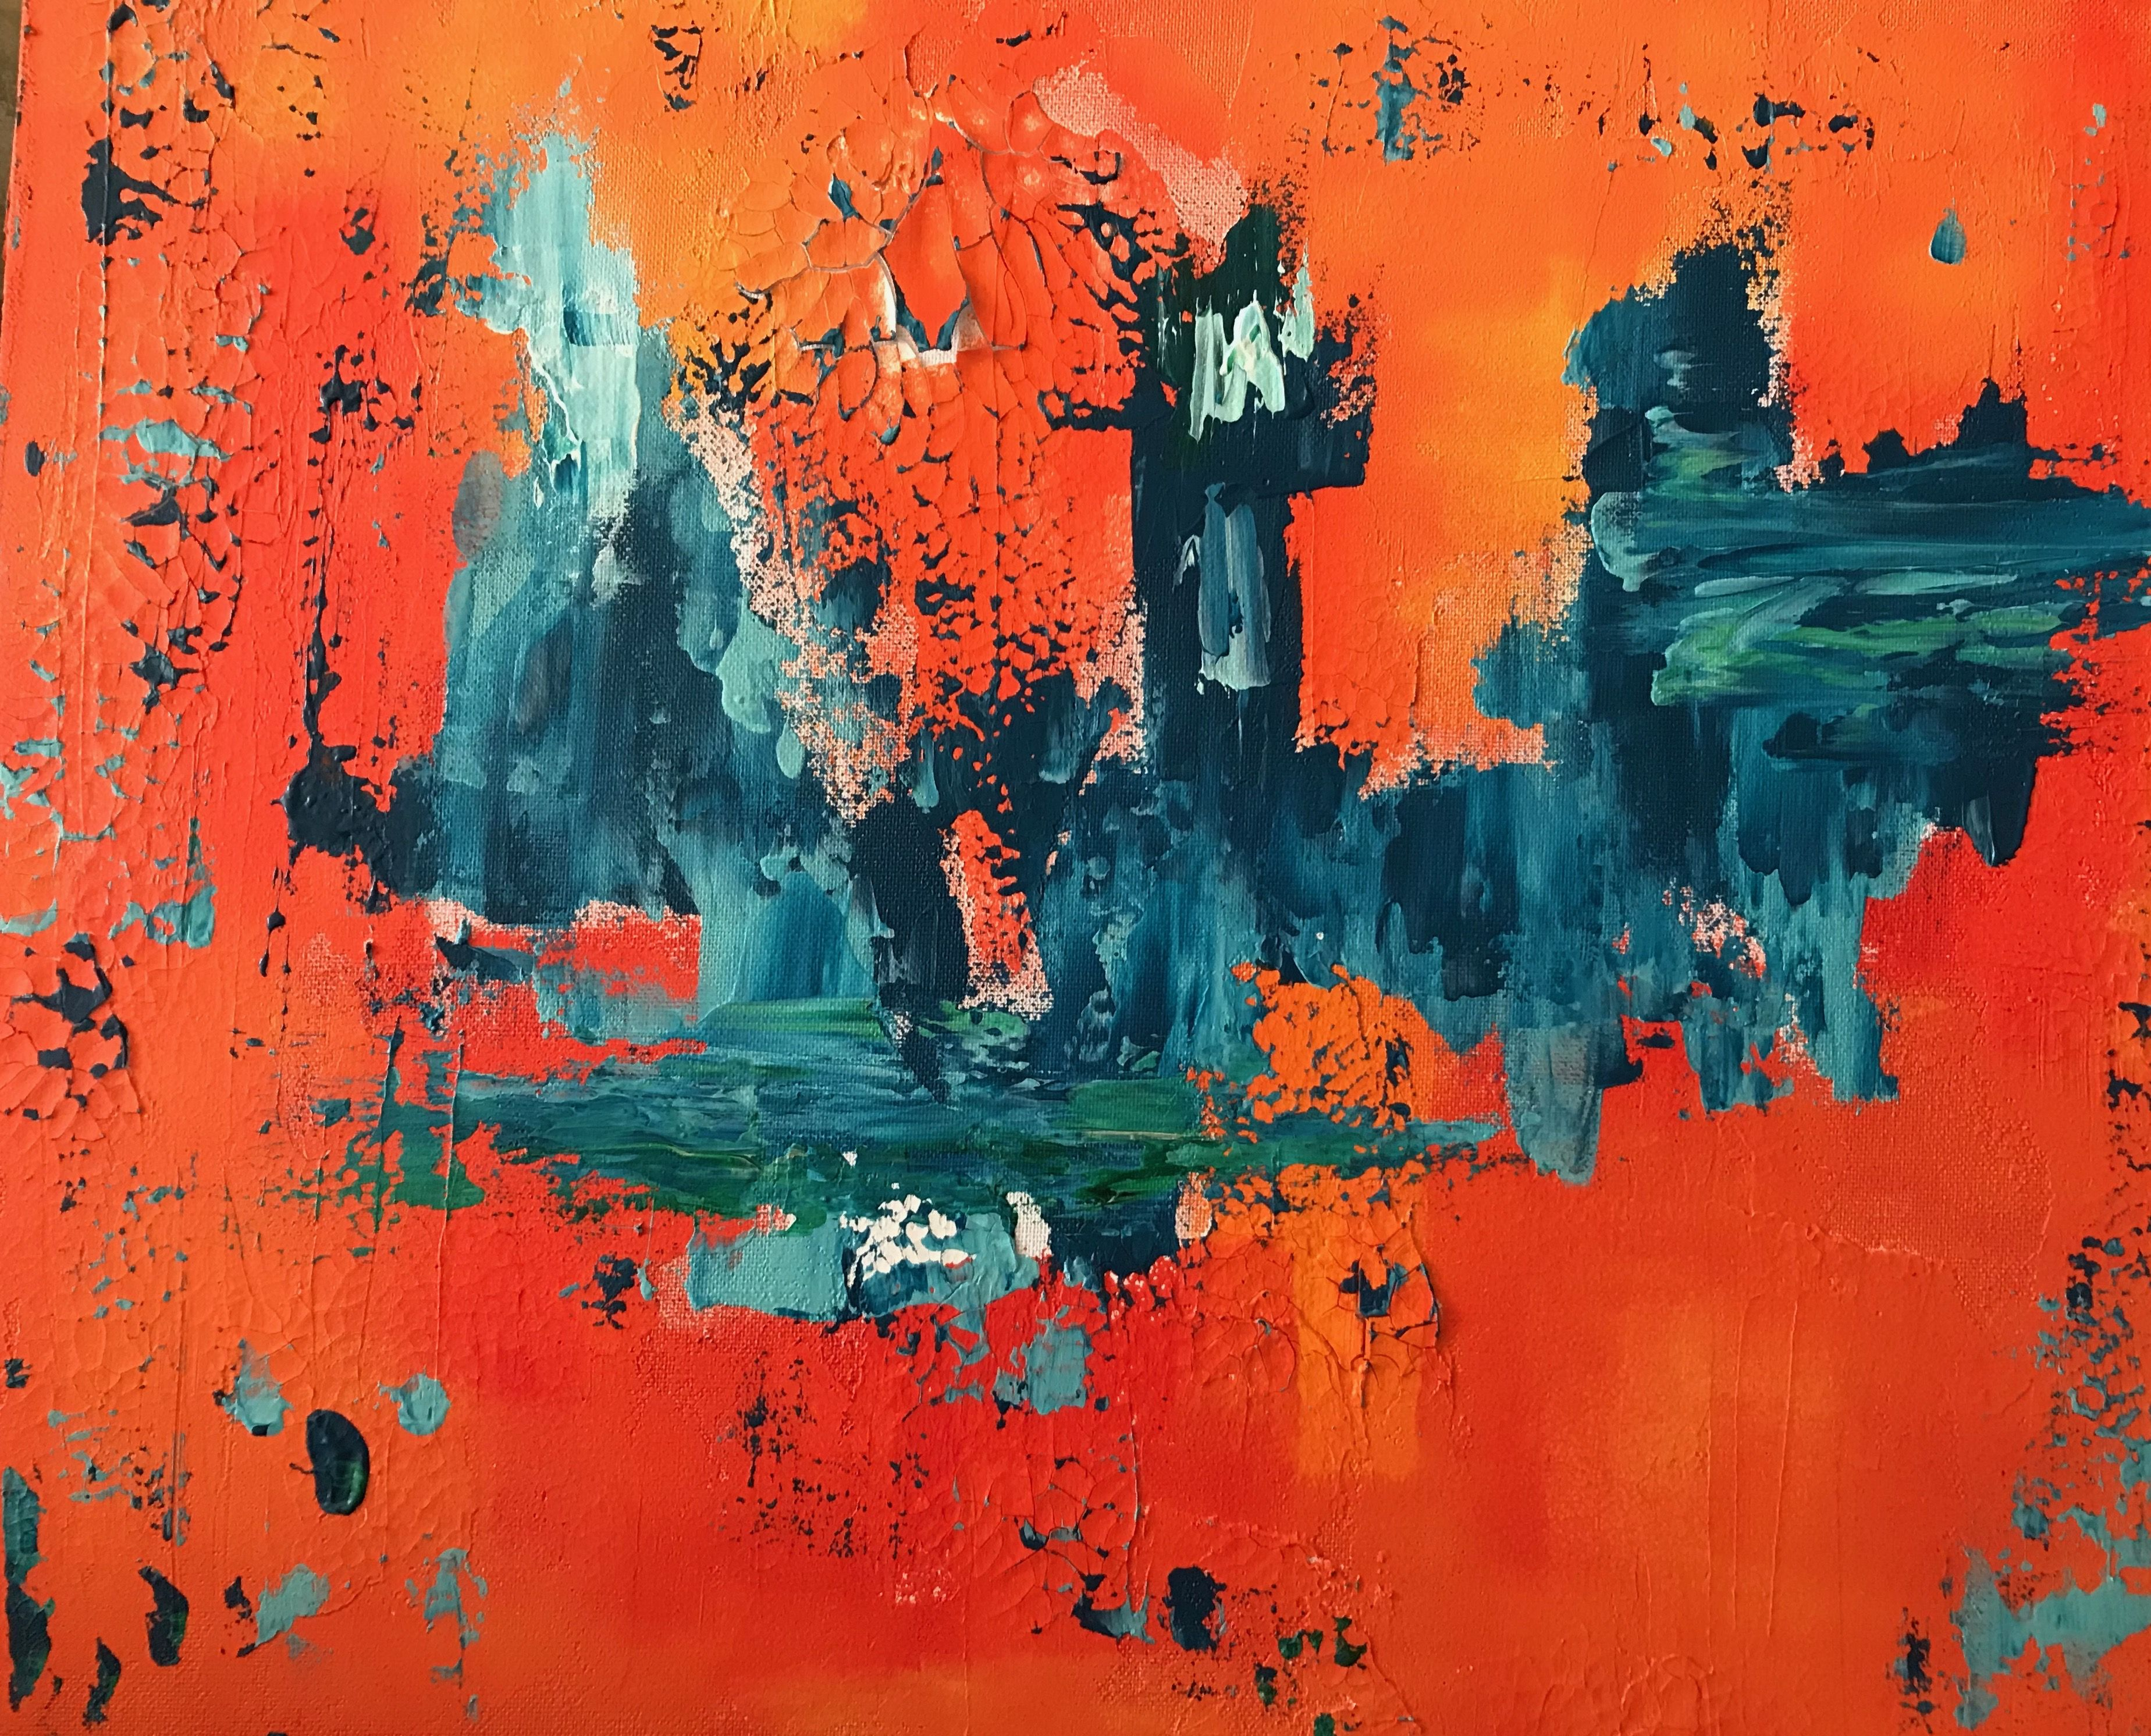 Am Art Acryl Acrylcolour Modern Art Abstract Abstract Art Turkis Orange Green Spachteltechnik Abstrakt 50x70 Cm Le Abstrakt Spachteltechnik Leinen